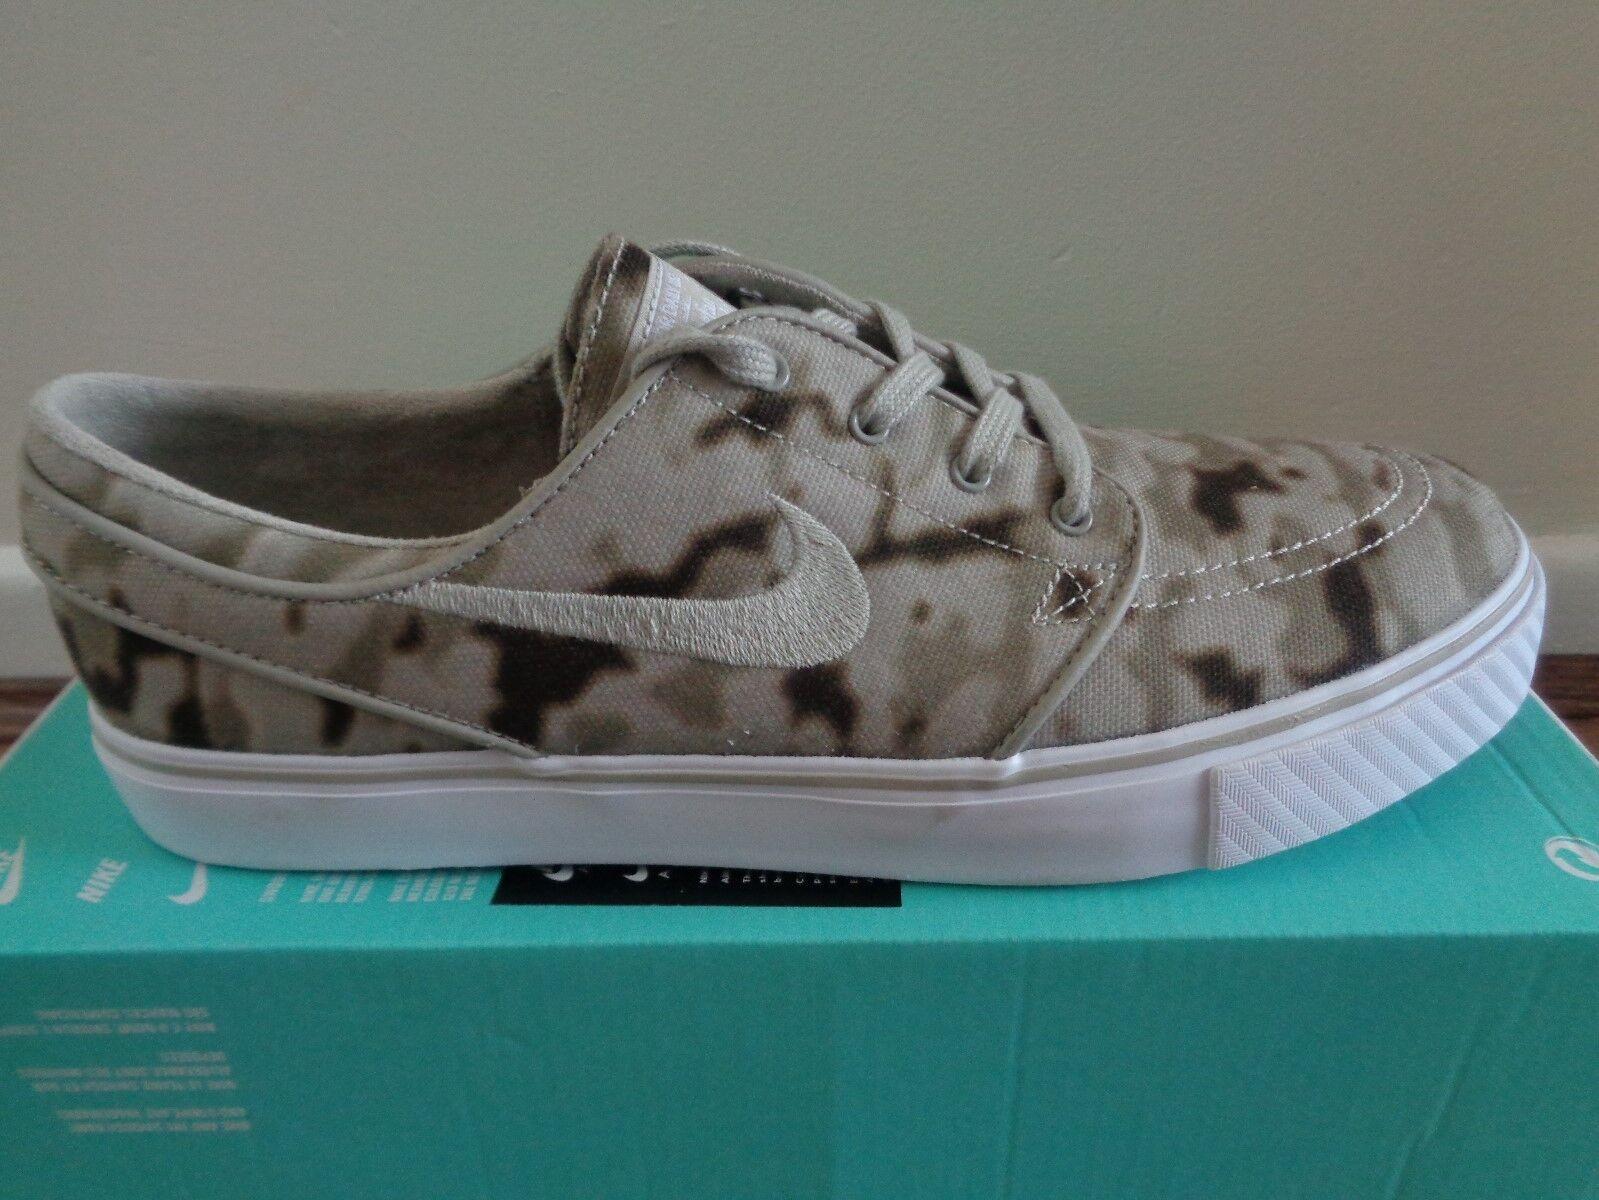 Nike SB Zoom Stefan Janoski mens shoes trainers sneakers 333824 207 NEW